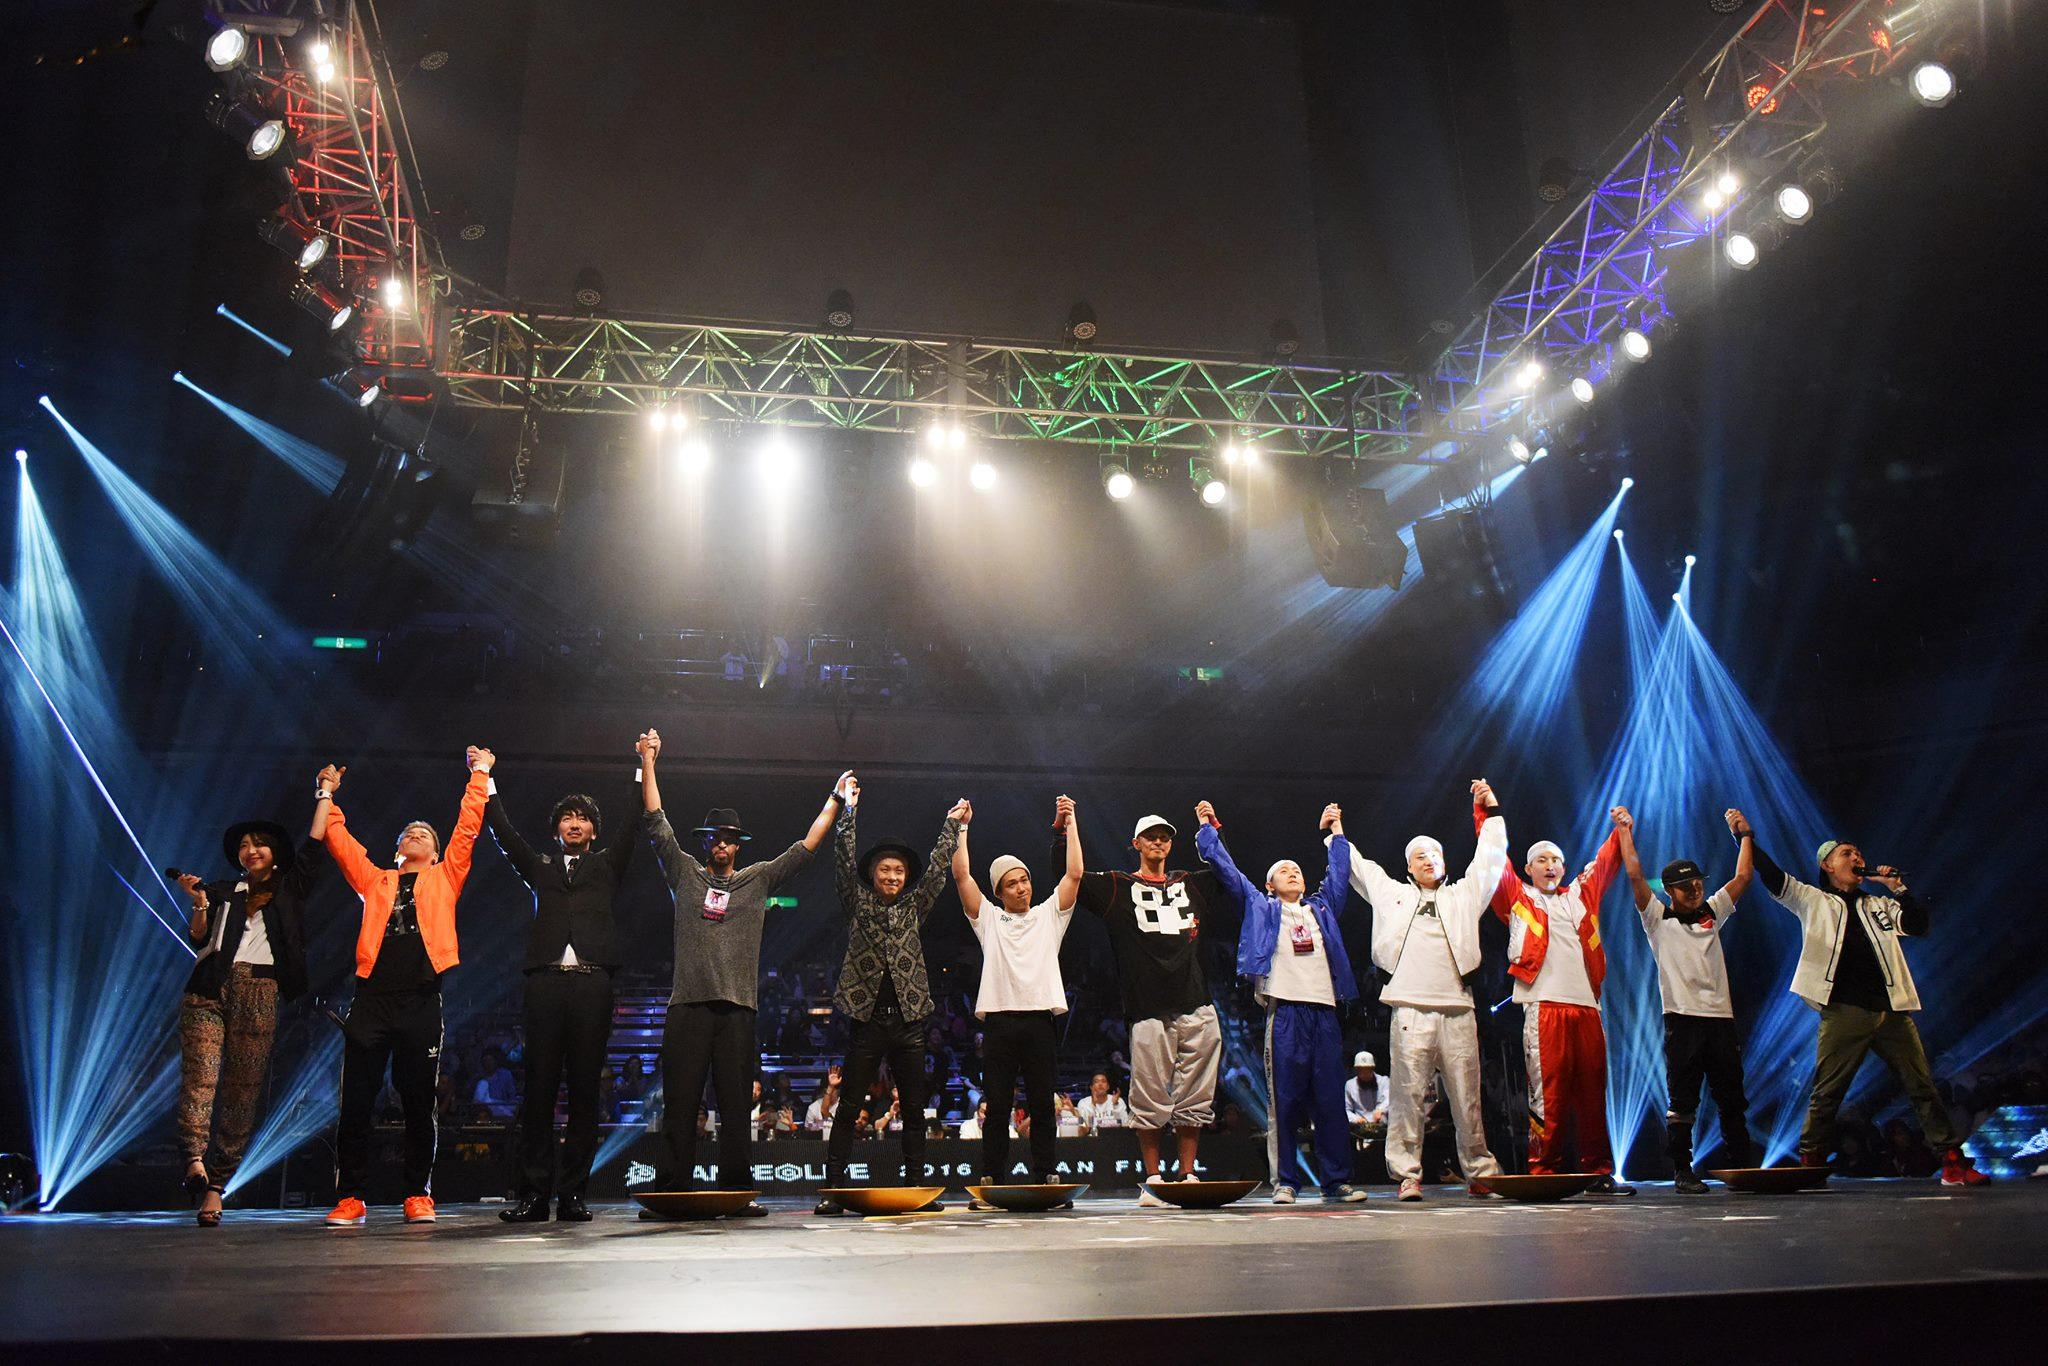 『DANCE@LIVE 2016 JAPAN FINAL』結果